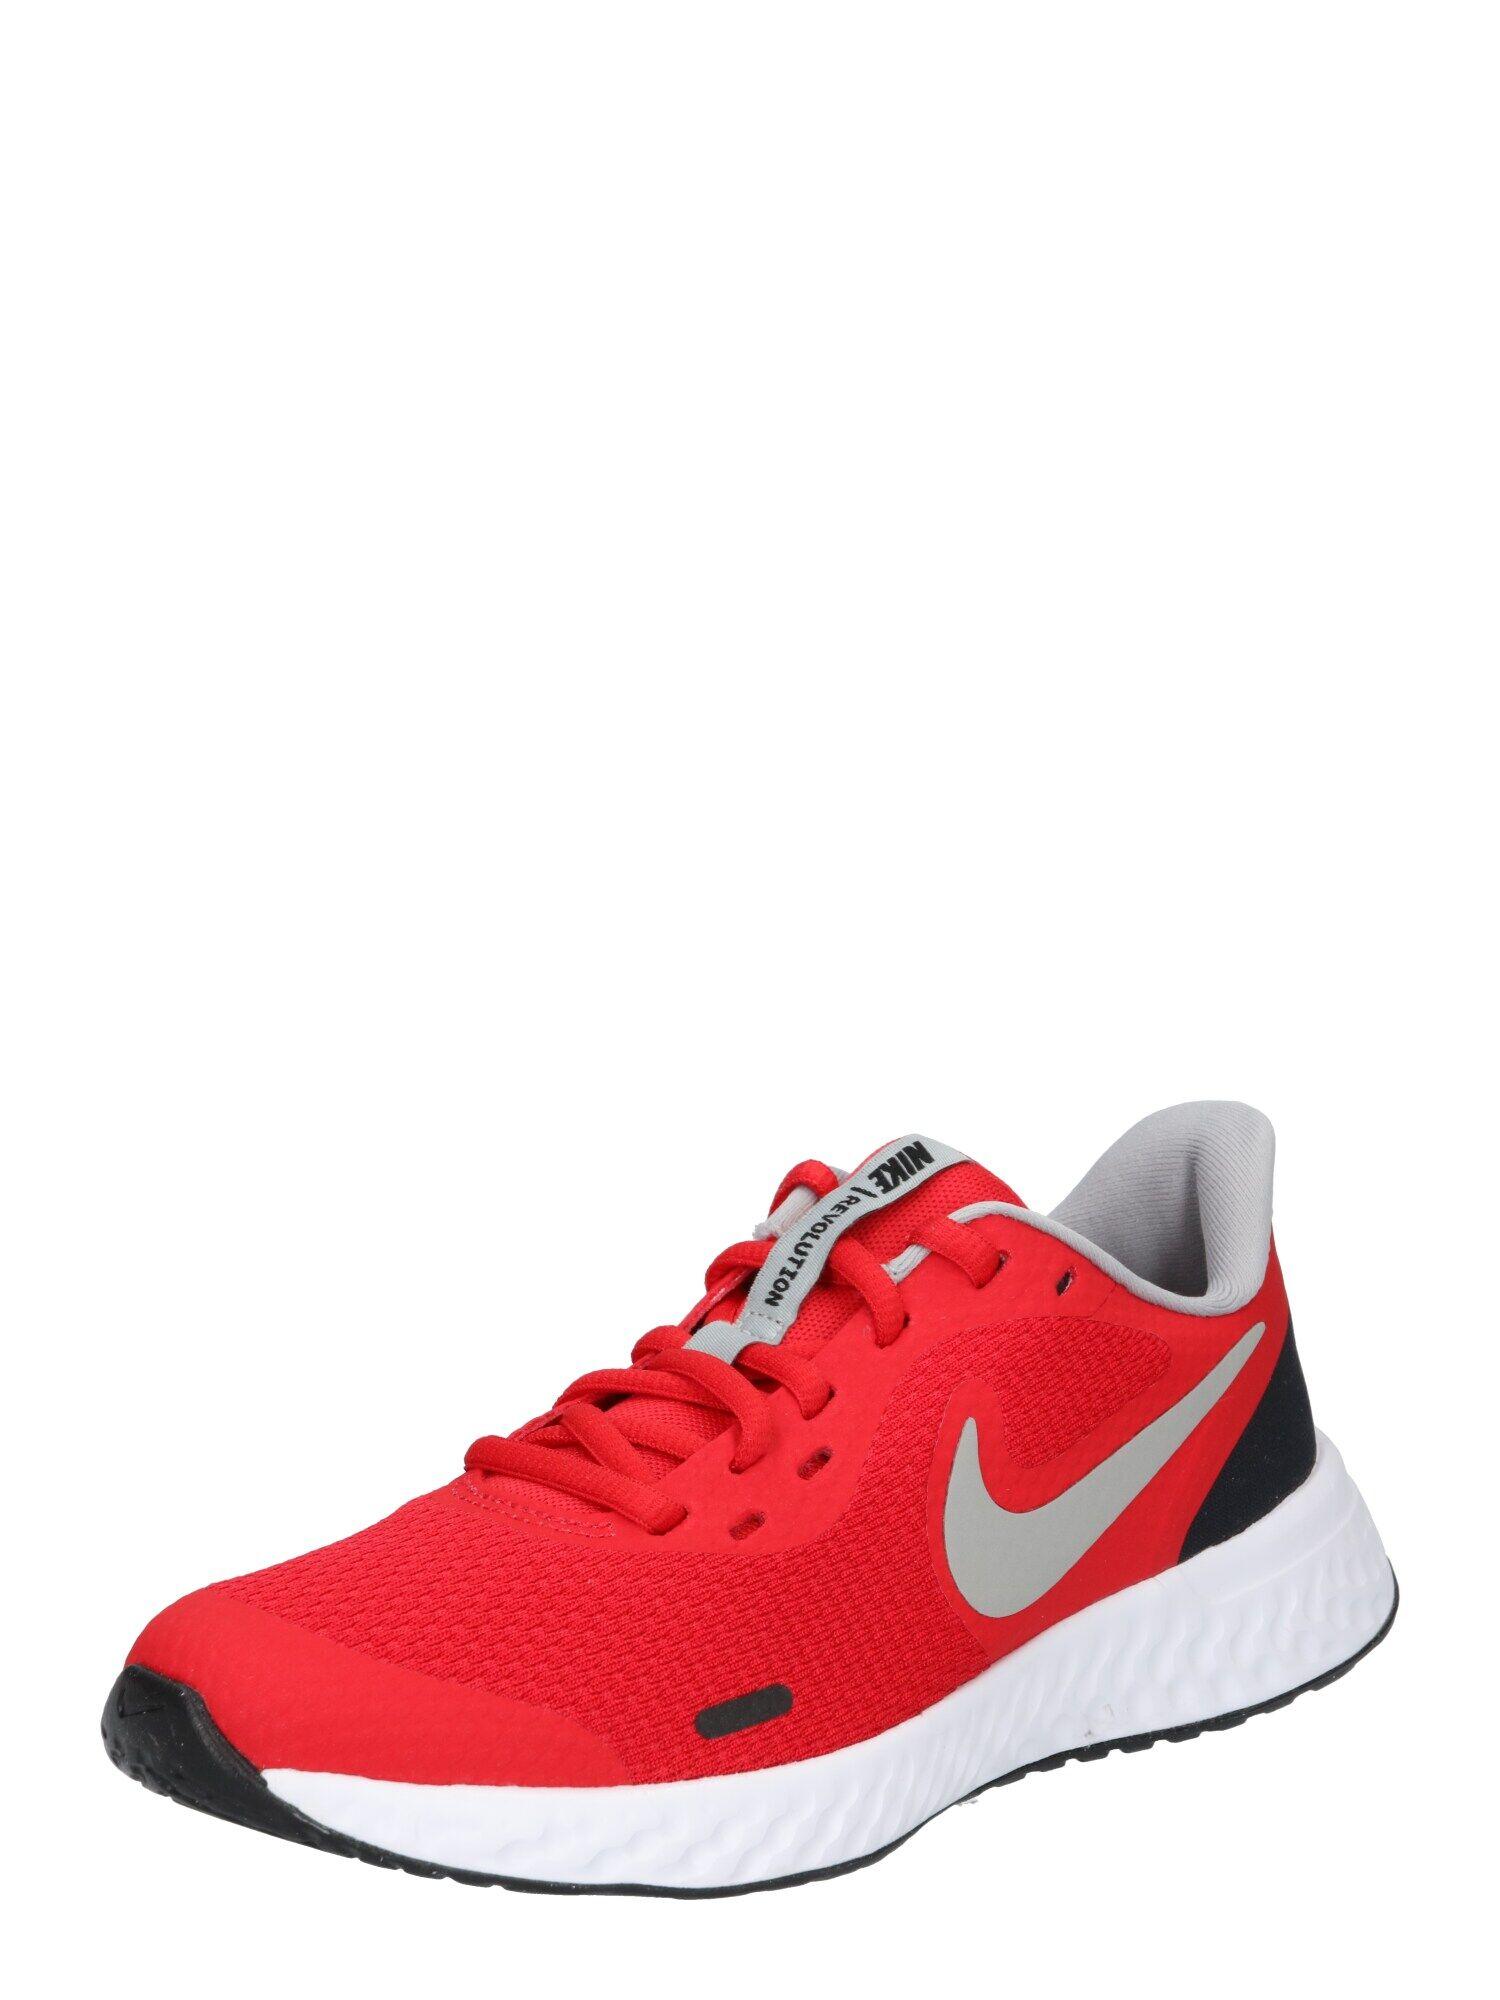 NIKE Chaussure de sport 'Revolution 5'  - Rouge - Taille: 4Y - boy